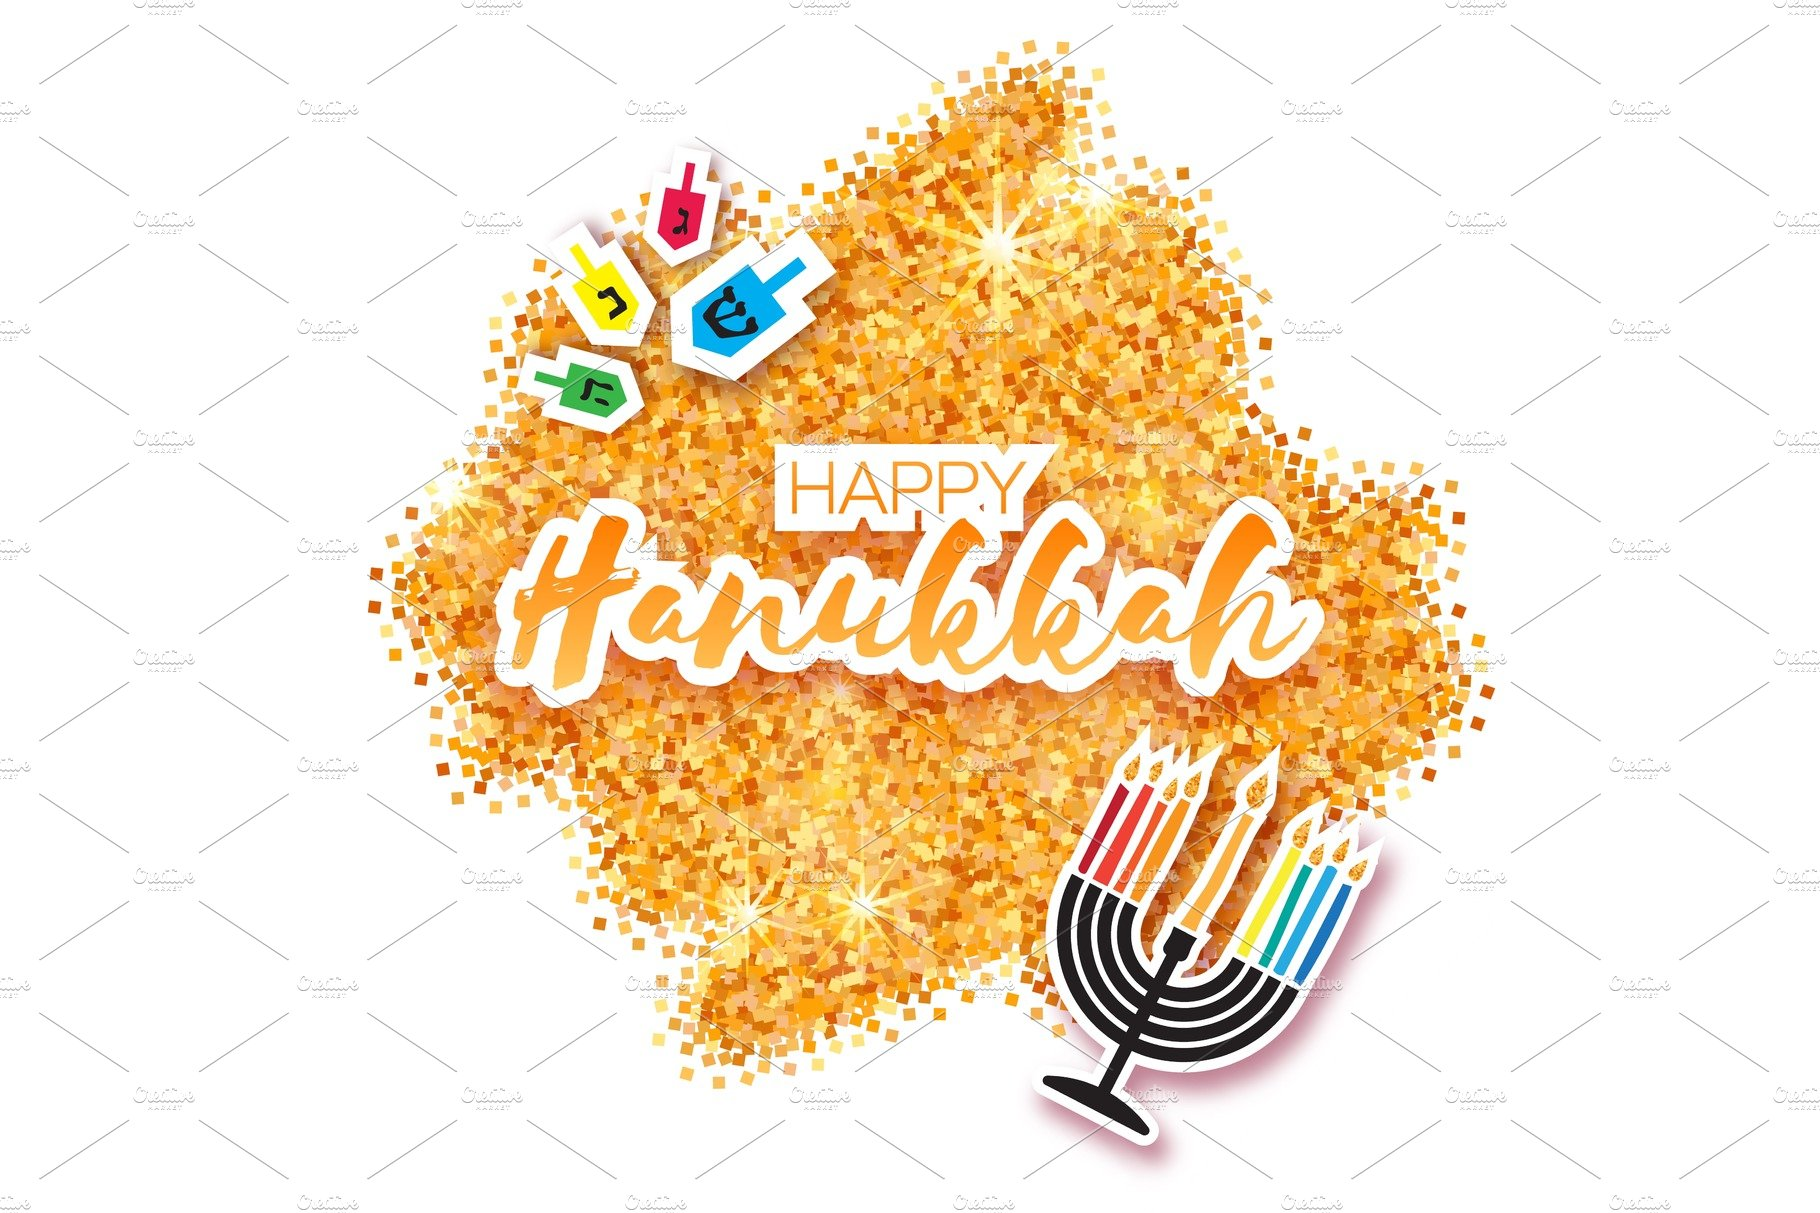 Origami Star Of David Happy Hanukkah Shining Stars Greeting Card